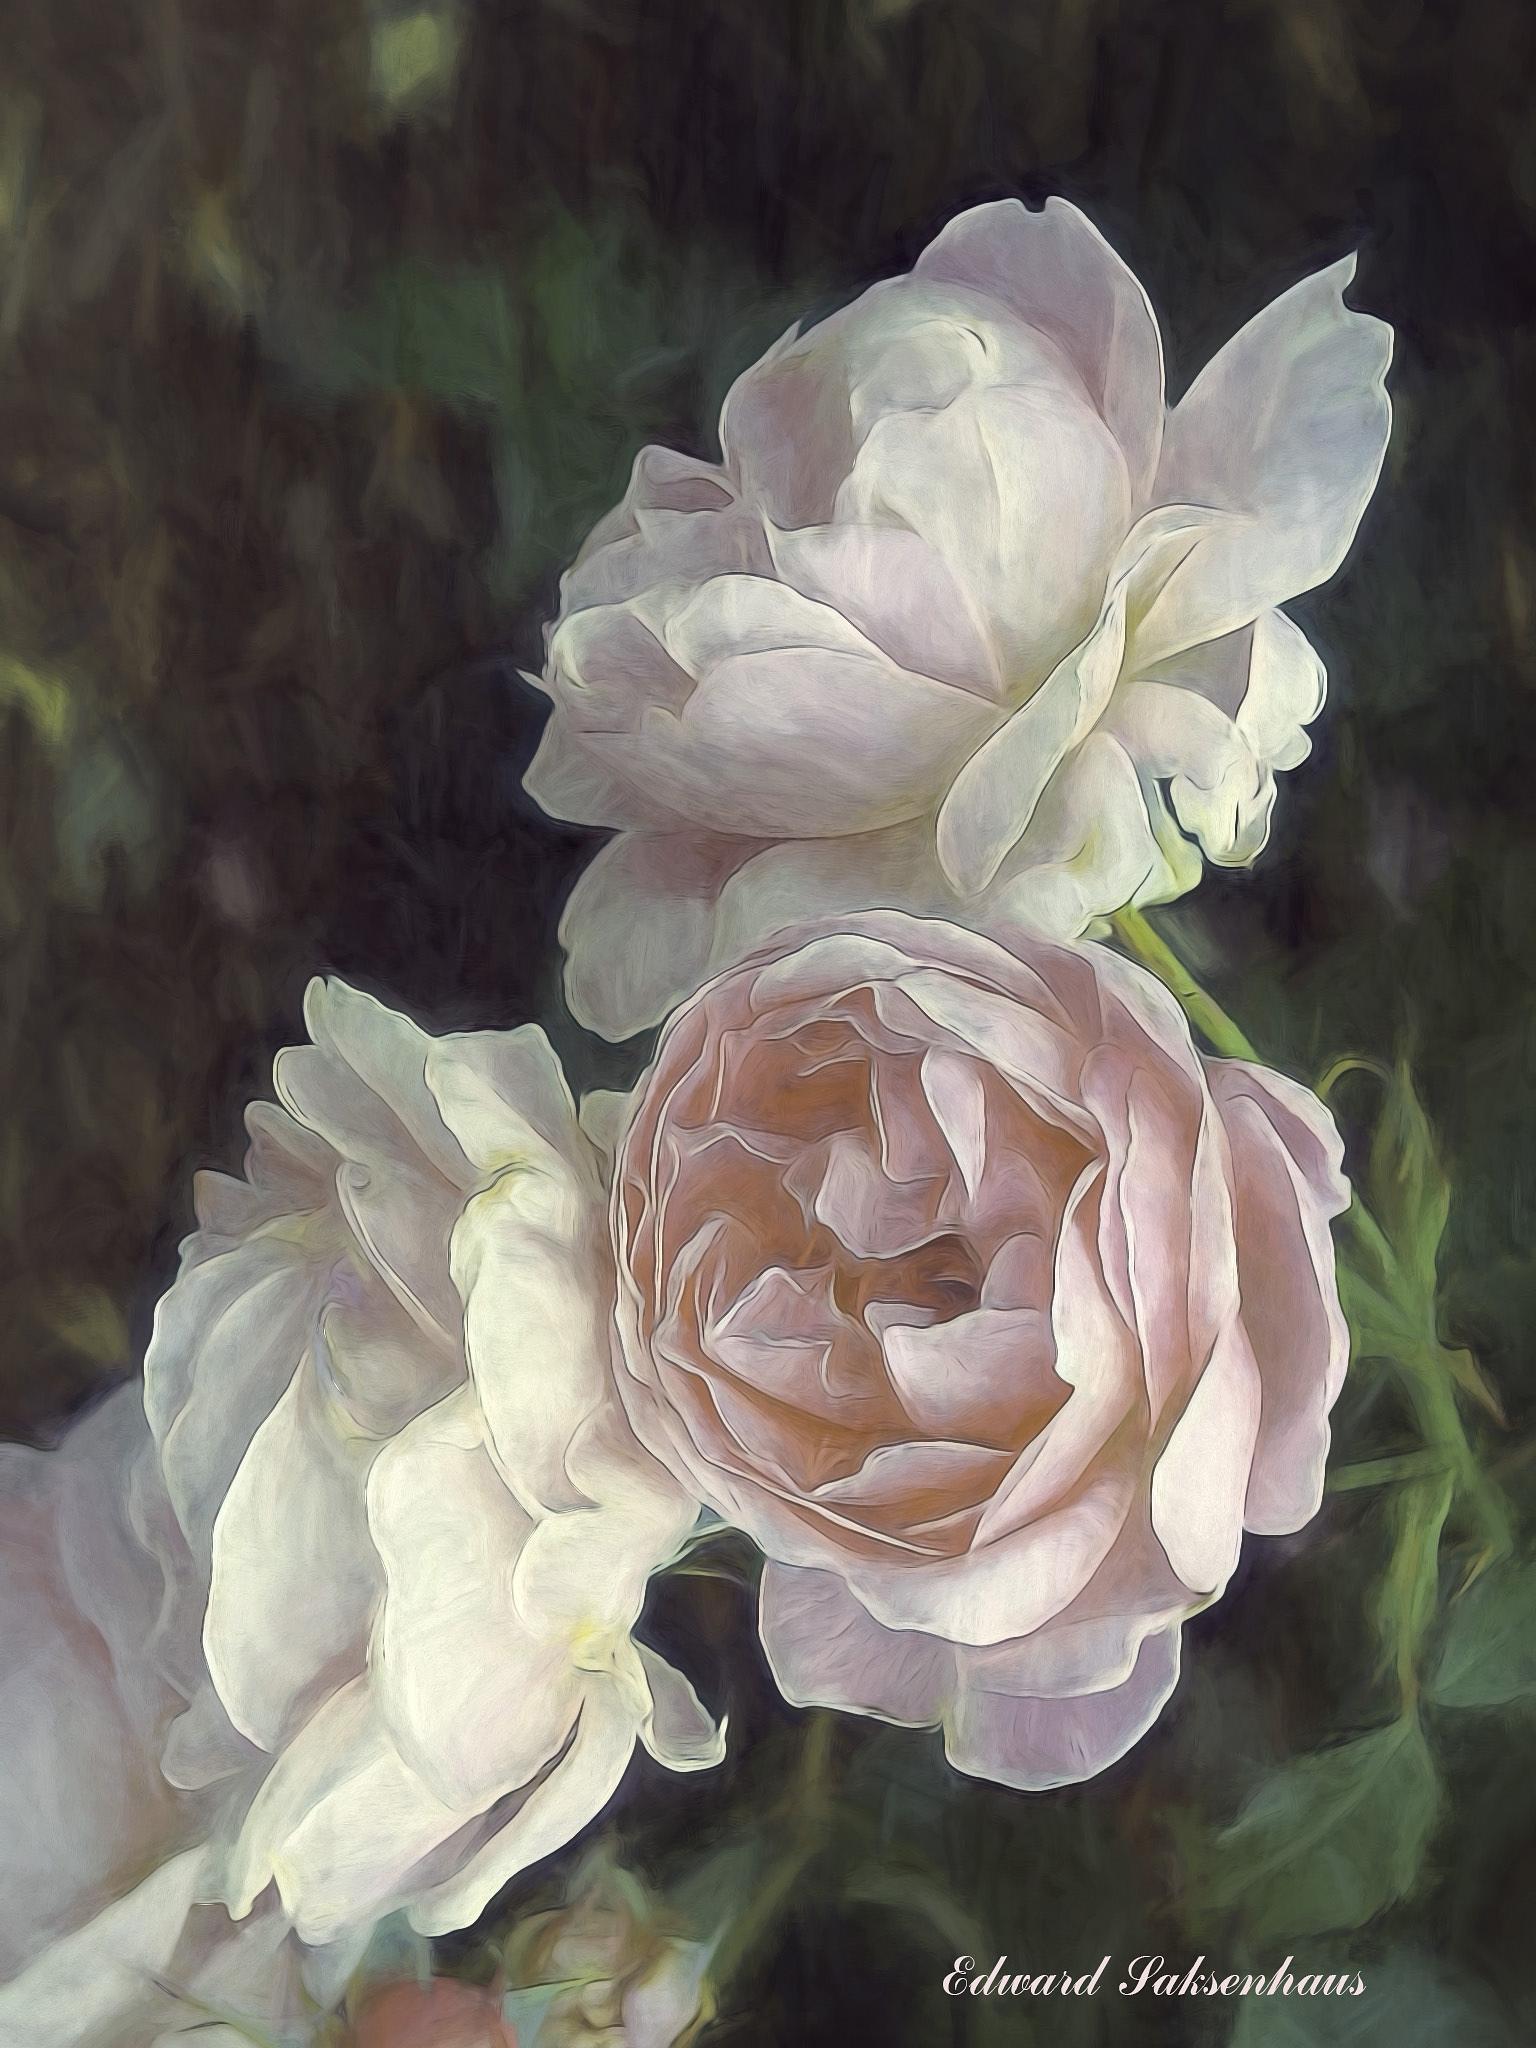 The Three Beautiful Roses by Edward Saksenhaus